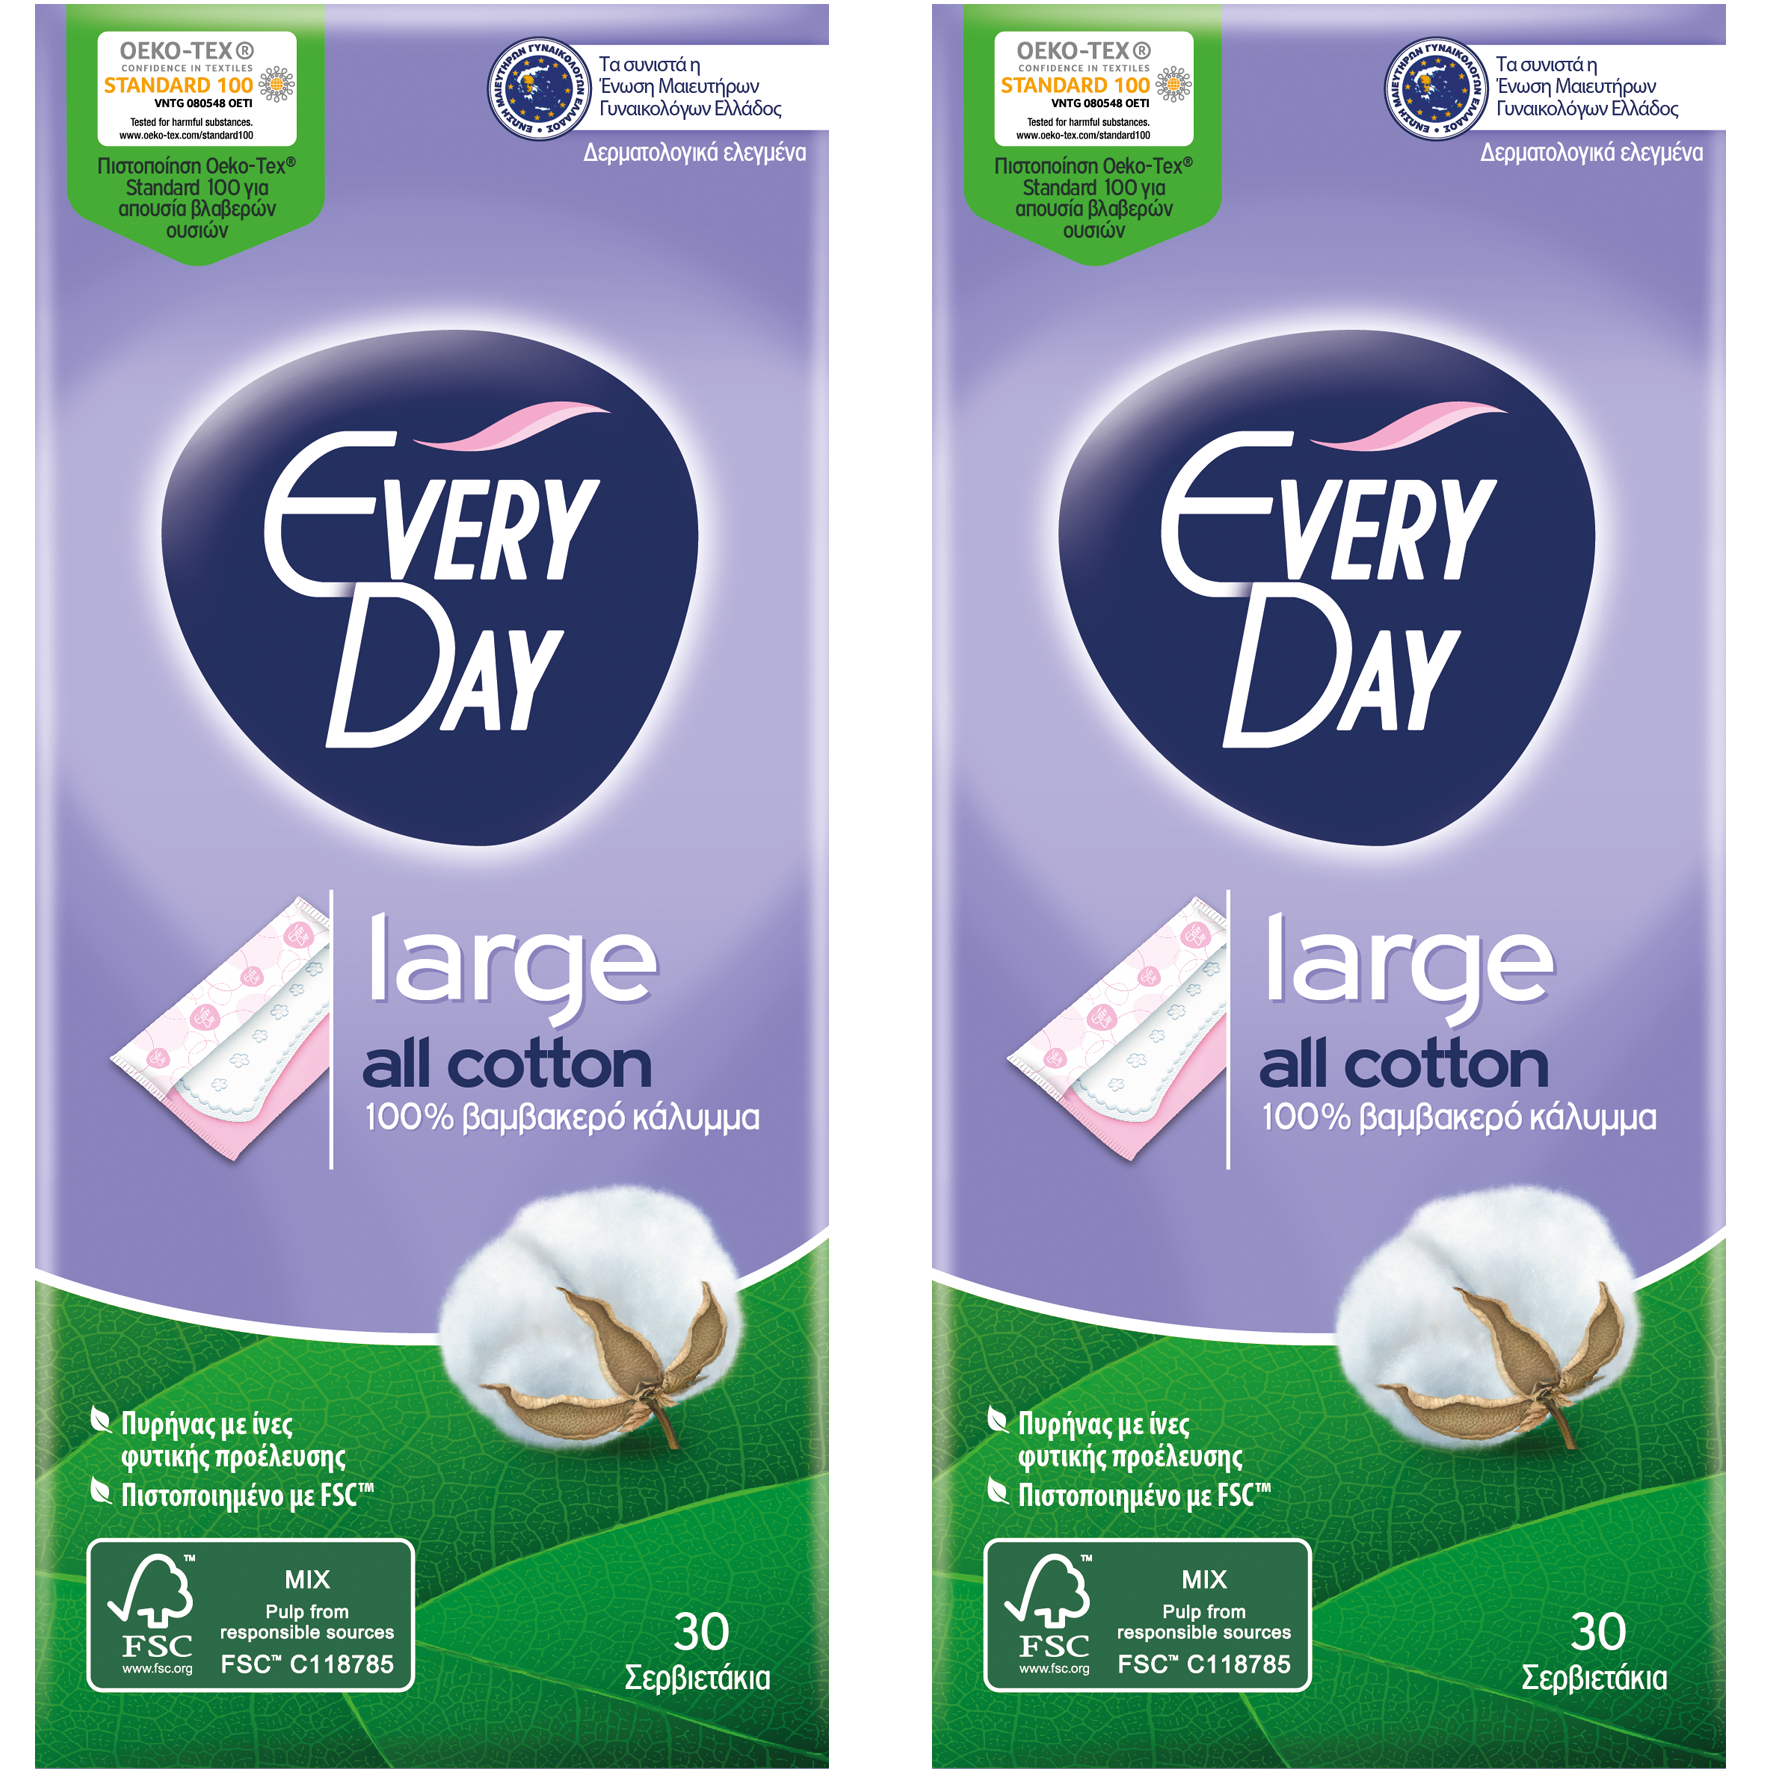 Every Day Πακέτο Προσφοράς All Cotton Large Ανατομικά Σερβιετάκια με Βαμβακερό Κάλυμμα 2×30 Τεμάχια 1+1 Δώρο